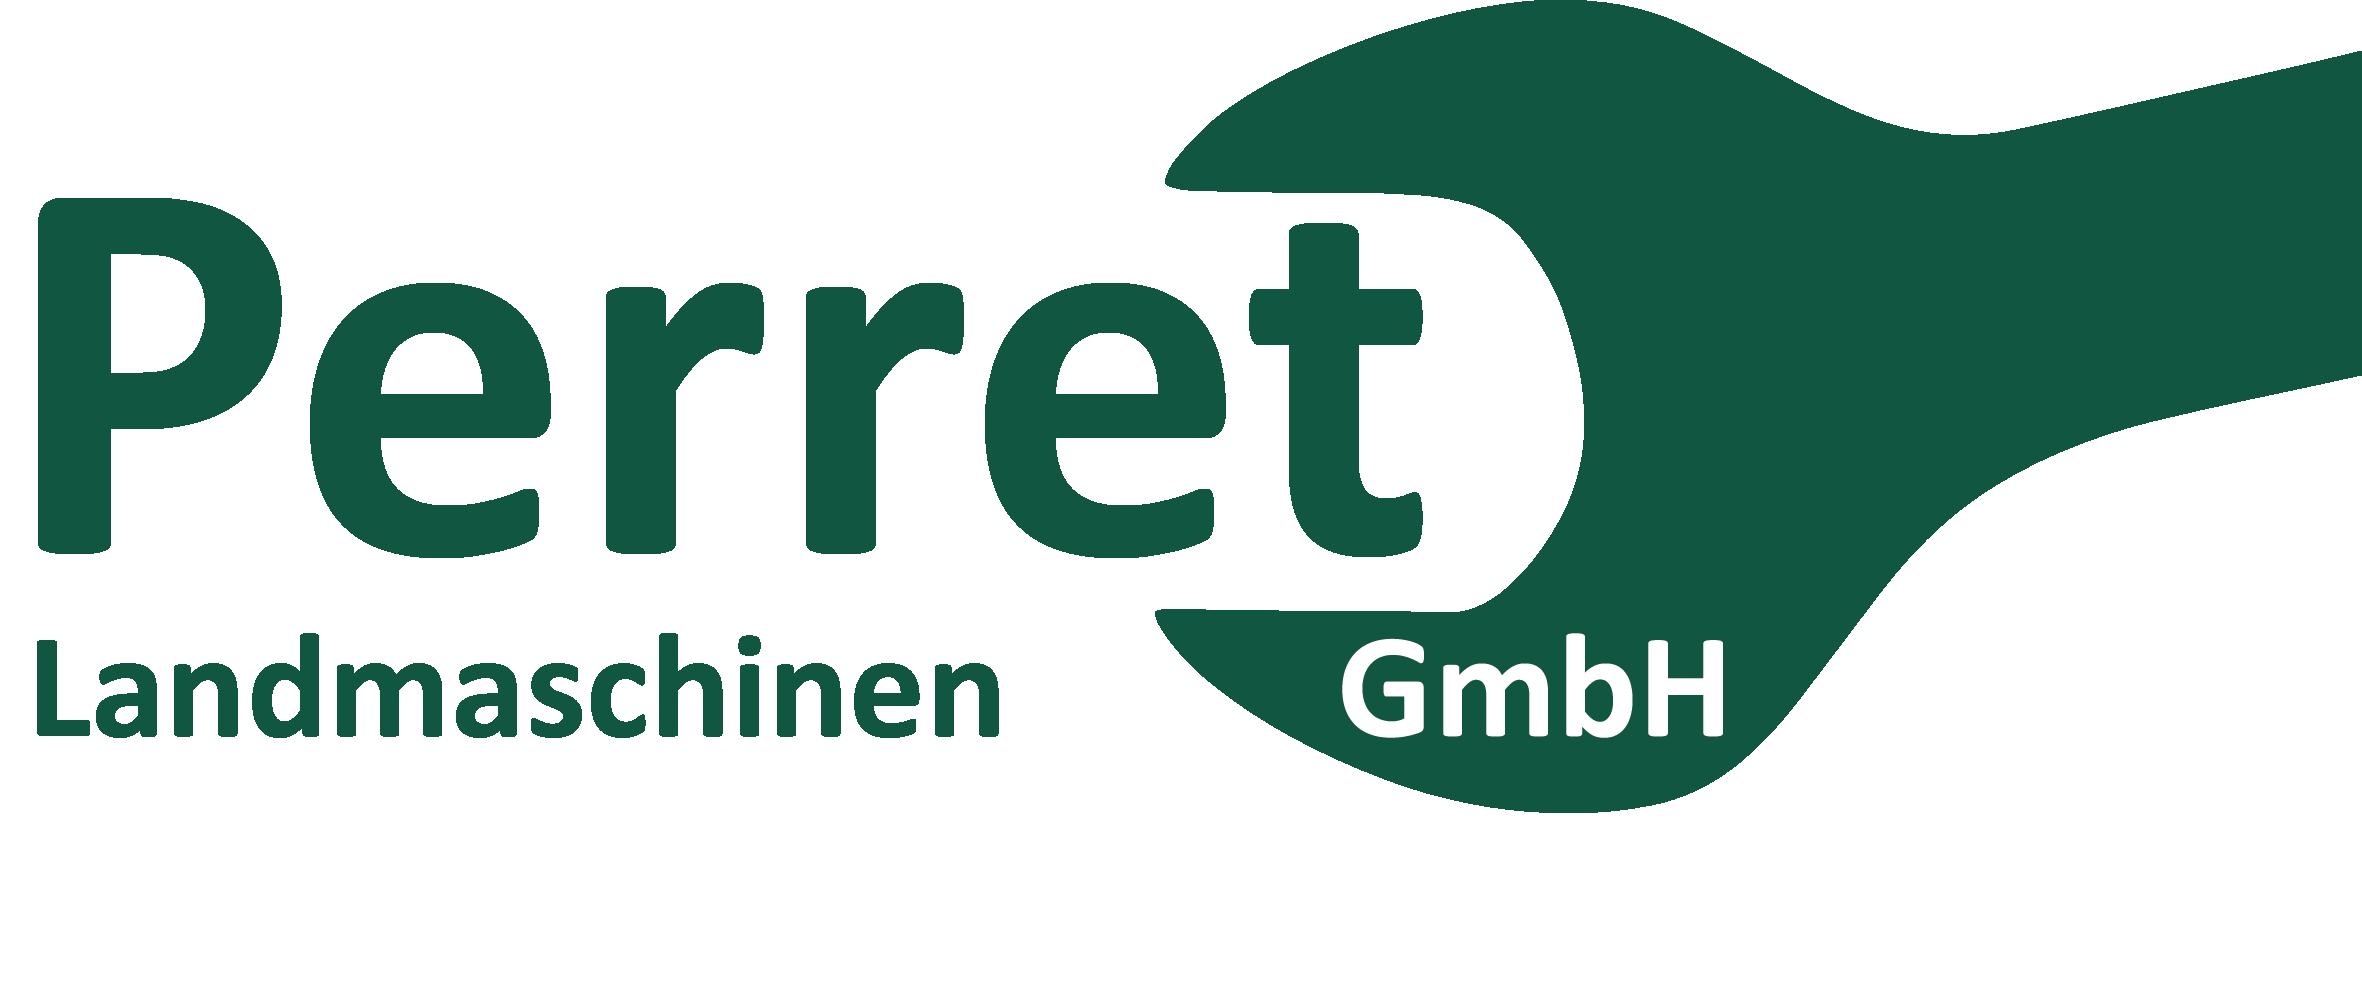 Perret Landmaschinen GmbH